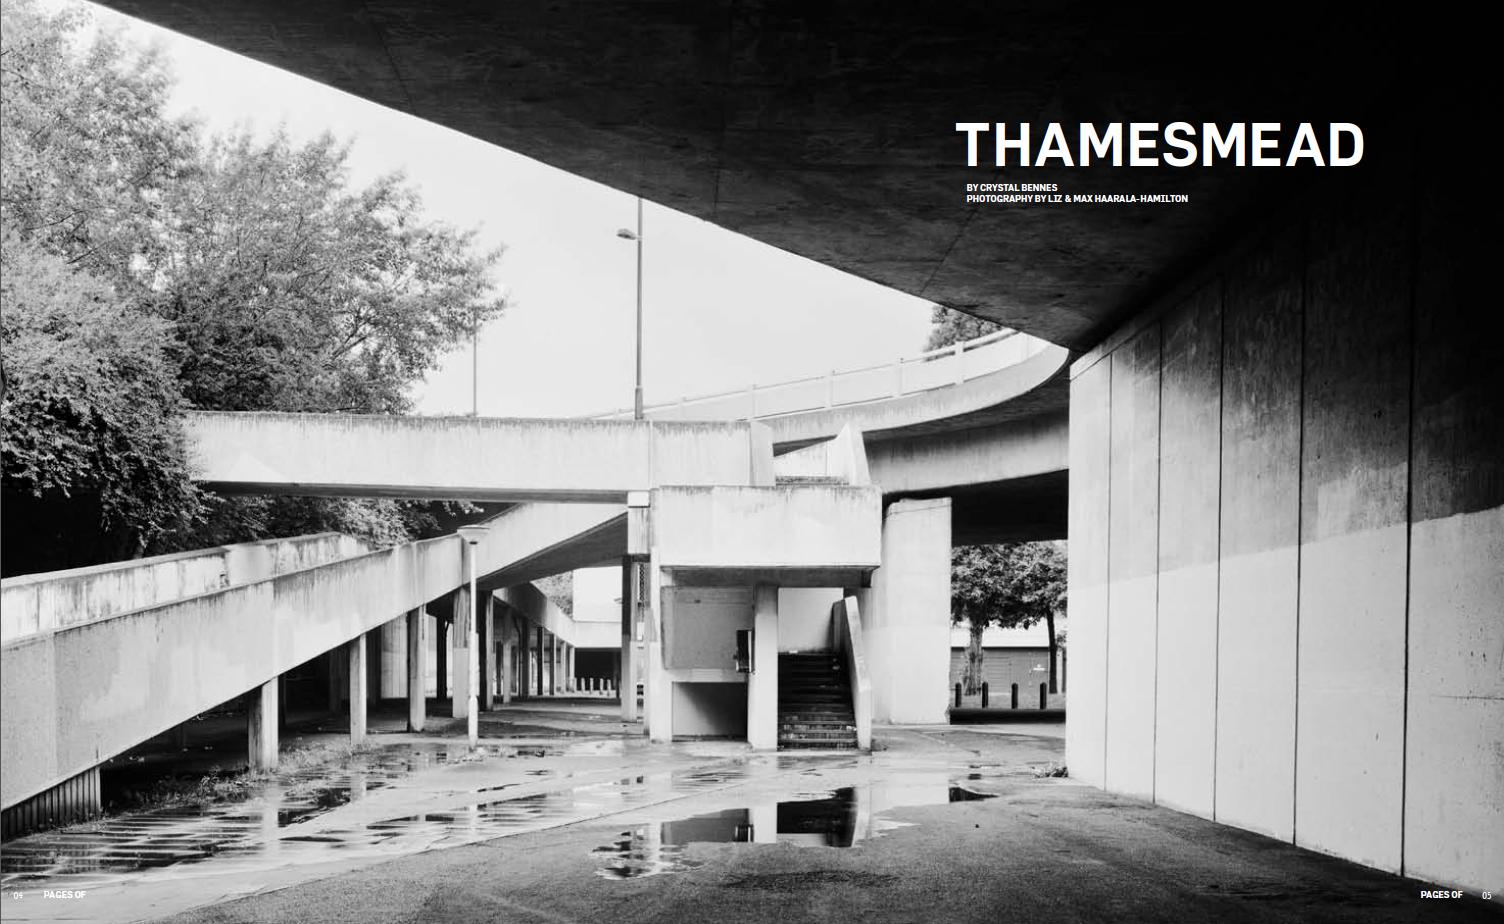 Thamesmead 01